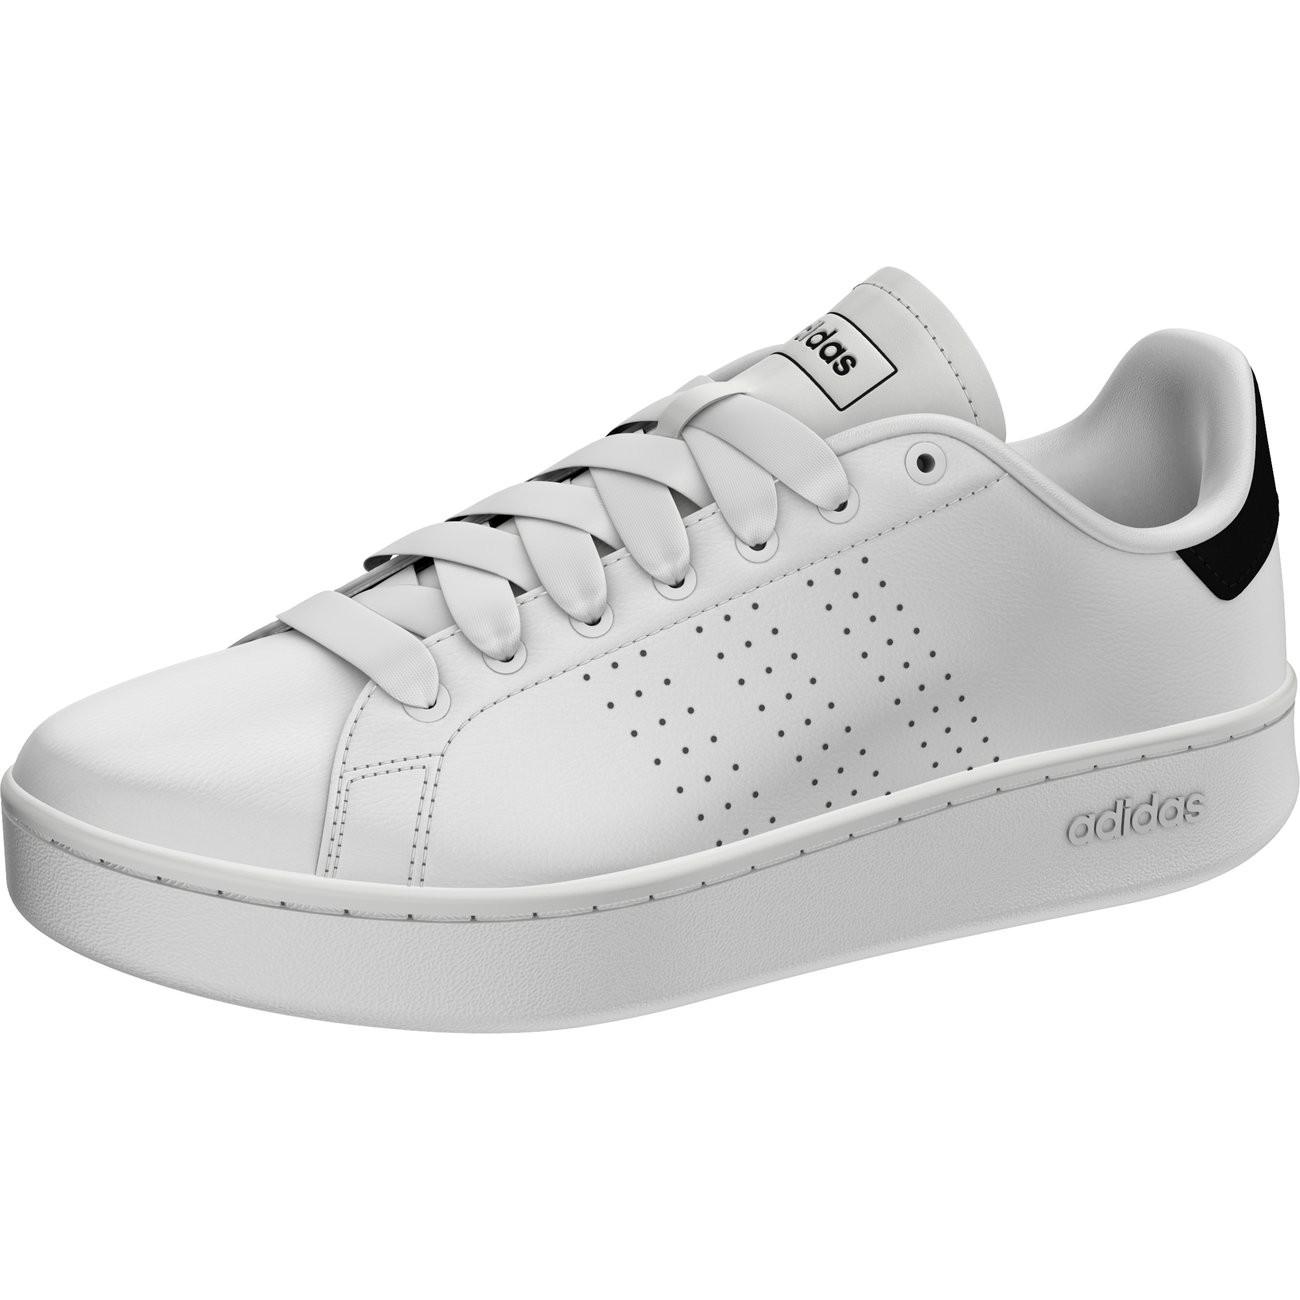 chaussure a femme adidas